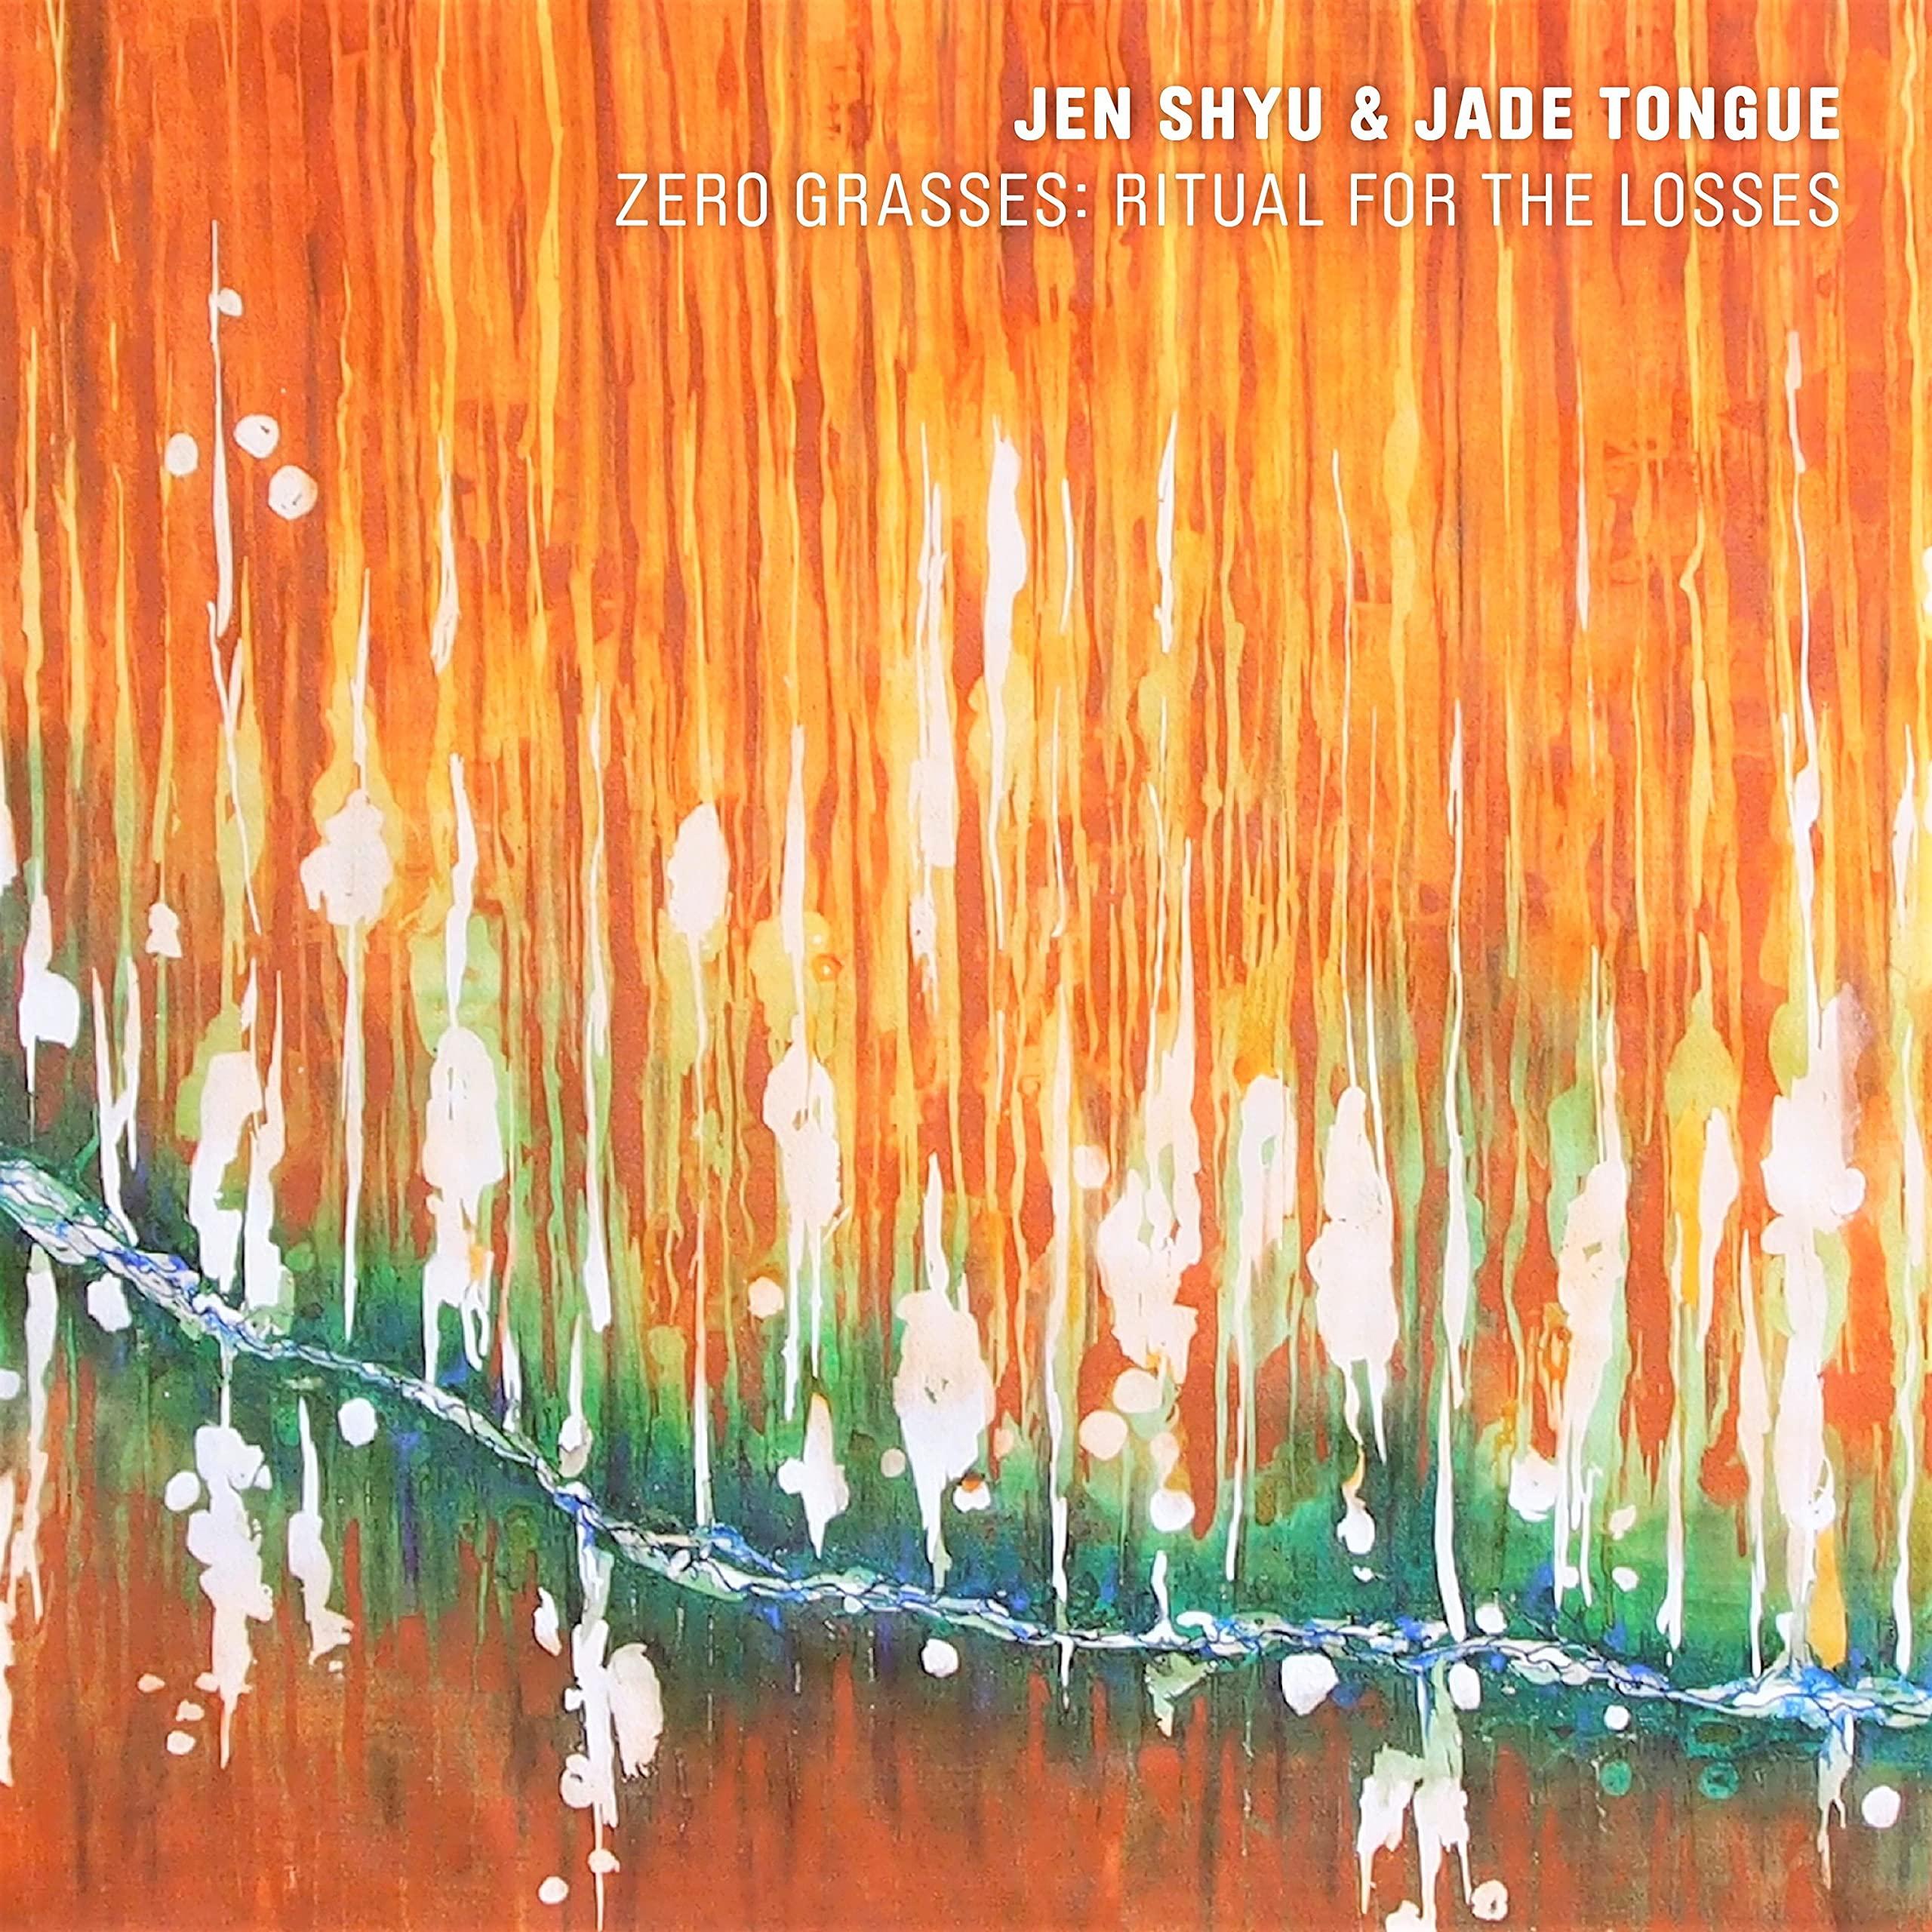 Jen Shyu & Jade Tongue - Zero Grasses: Ritual for the Losses (2021) [FLAC] Download